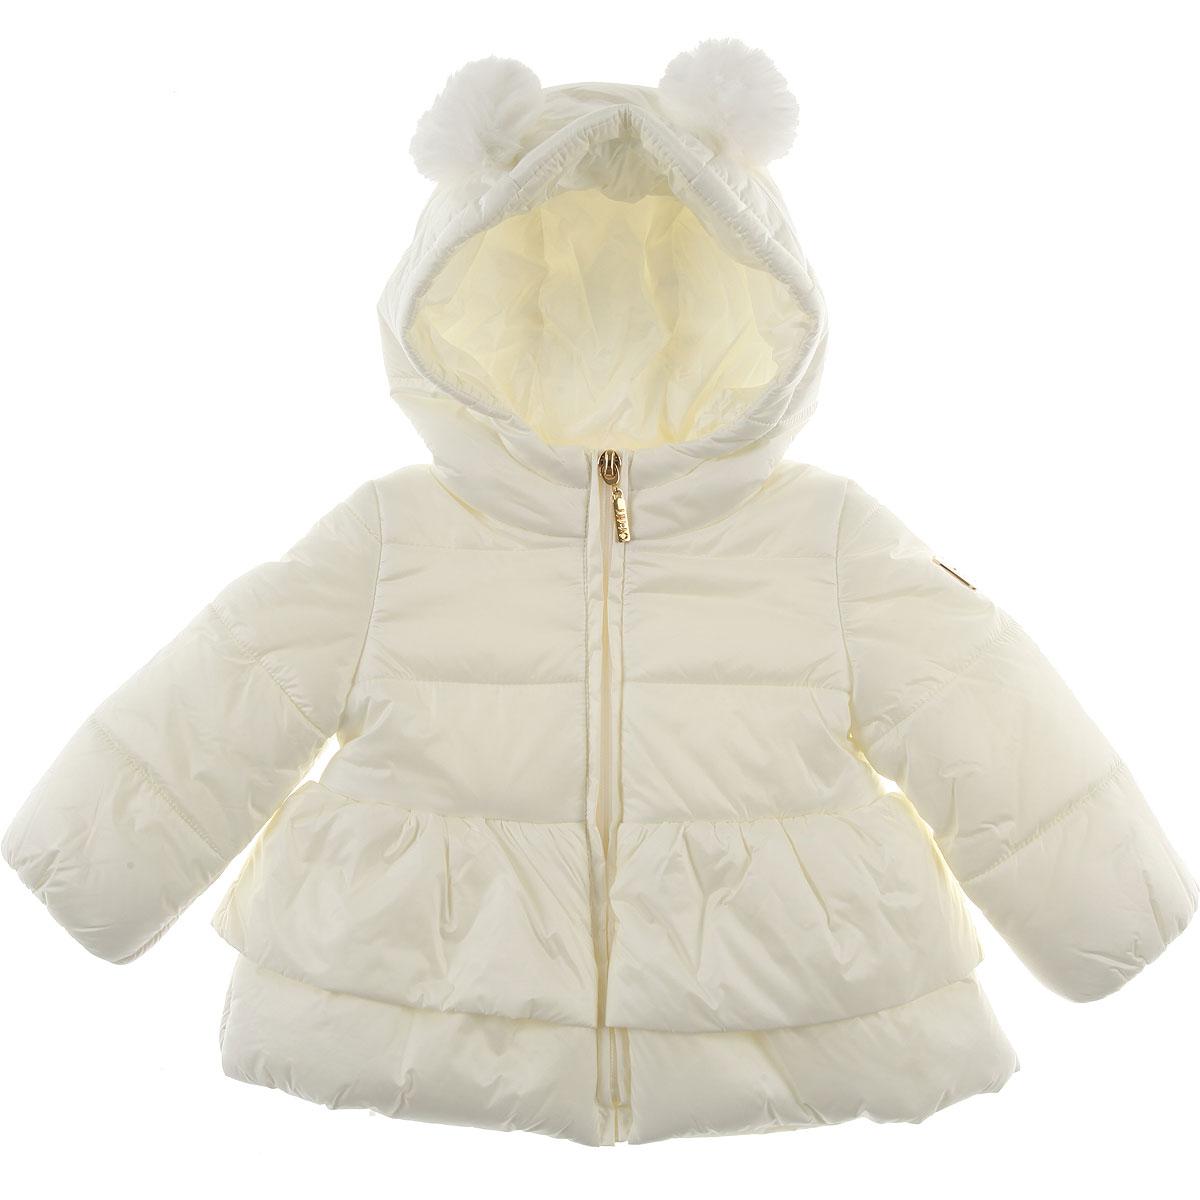 Image of Liu Jo Baby Down Jacket for Girls, White, polyamide, 2017, 18M 9M